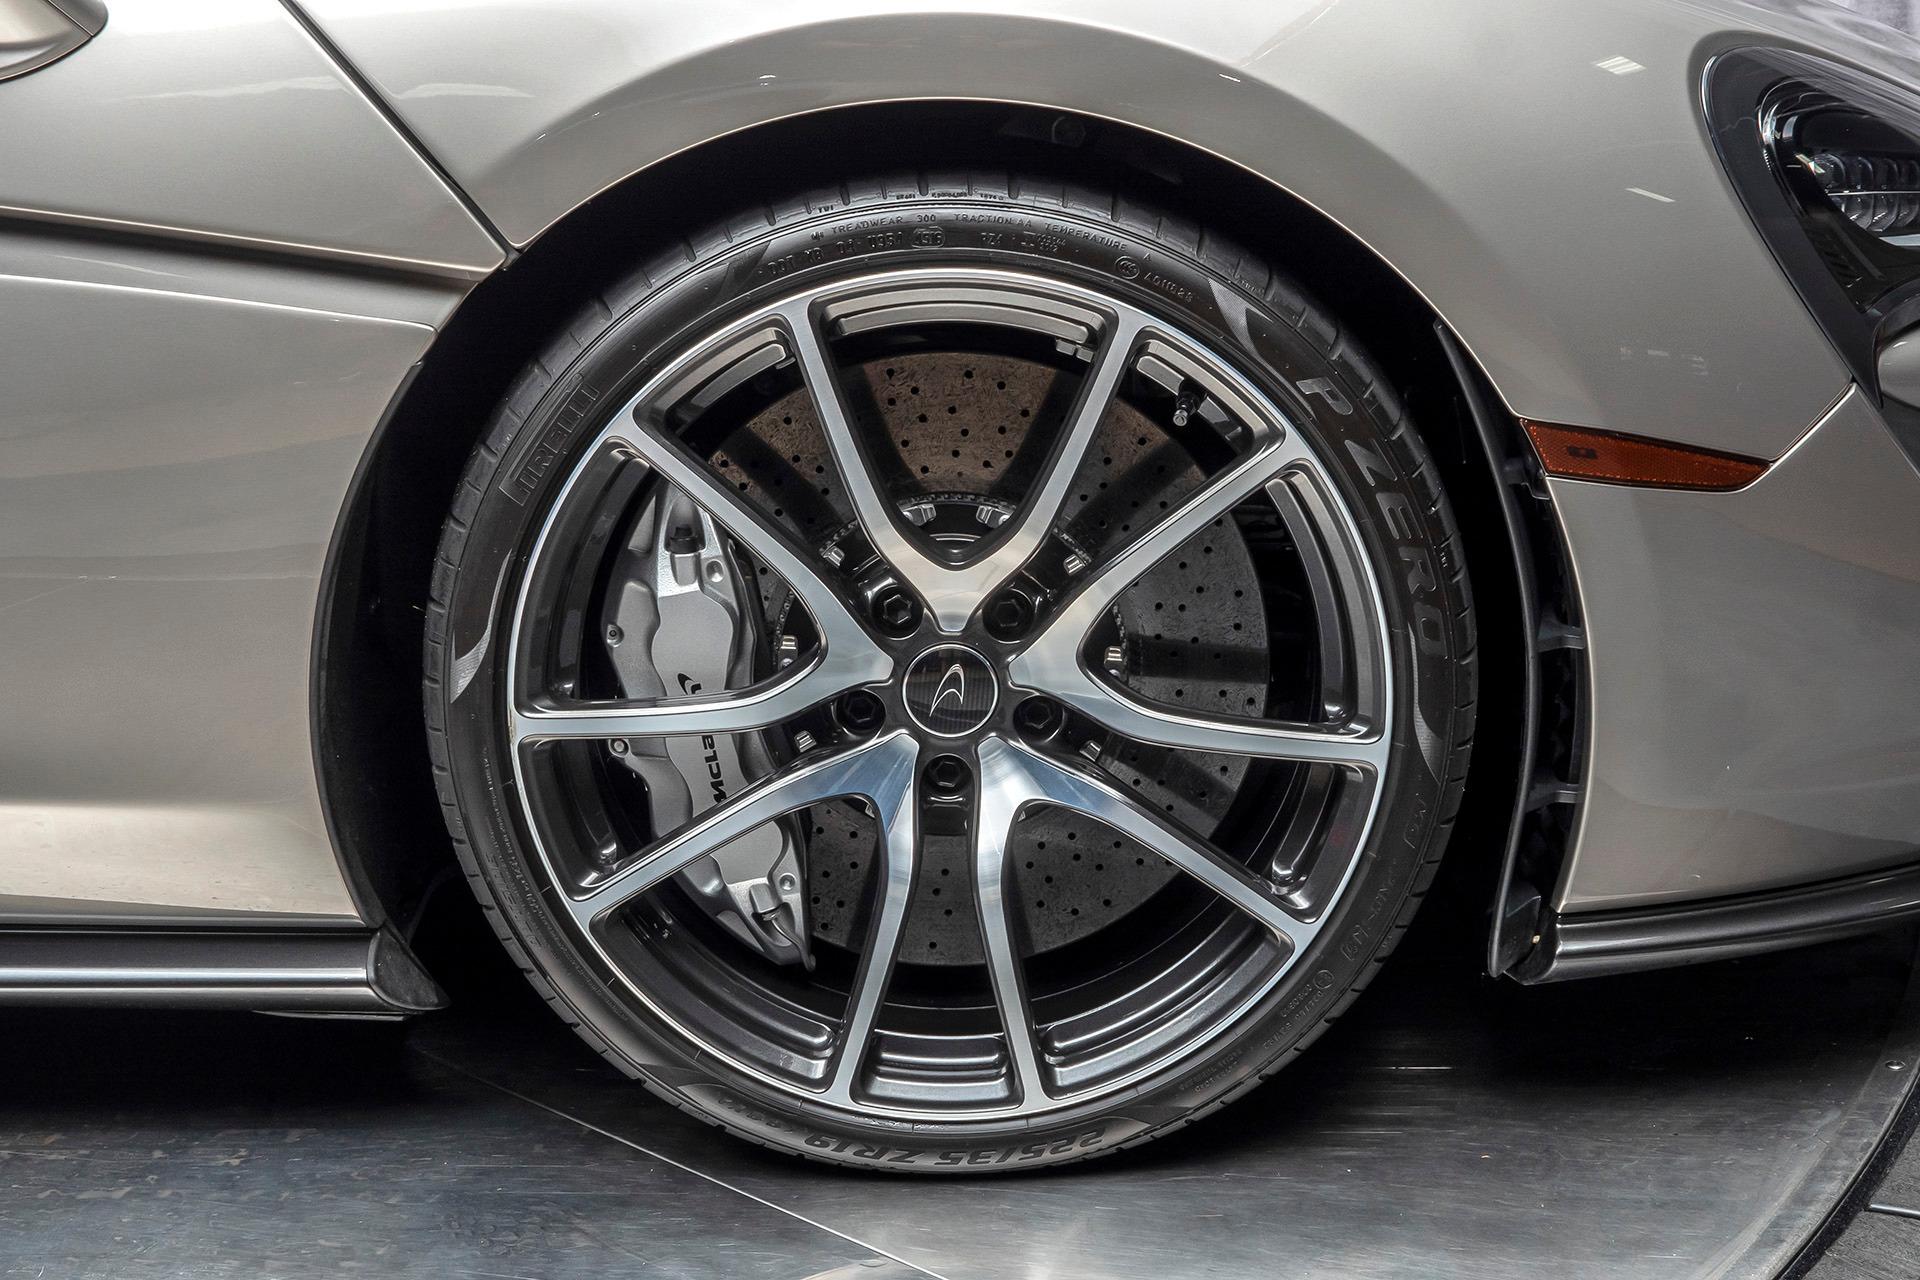 Used-2017-McLaren-570GT-Coupe-10-Spoke-Super-Lightweight-Diamond-Cut-Wheels